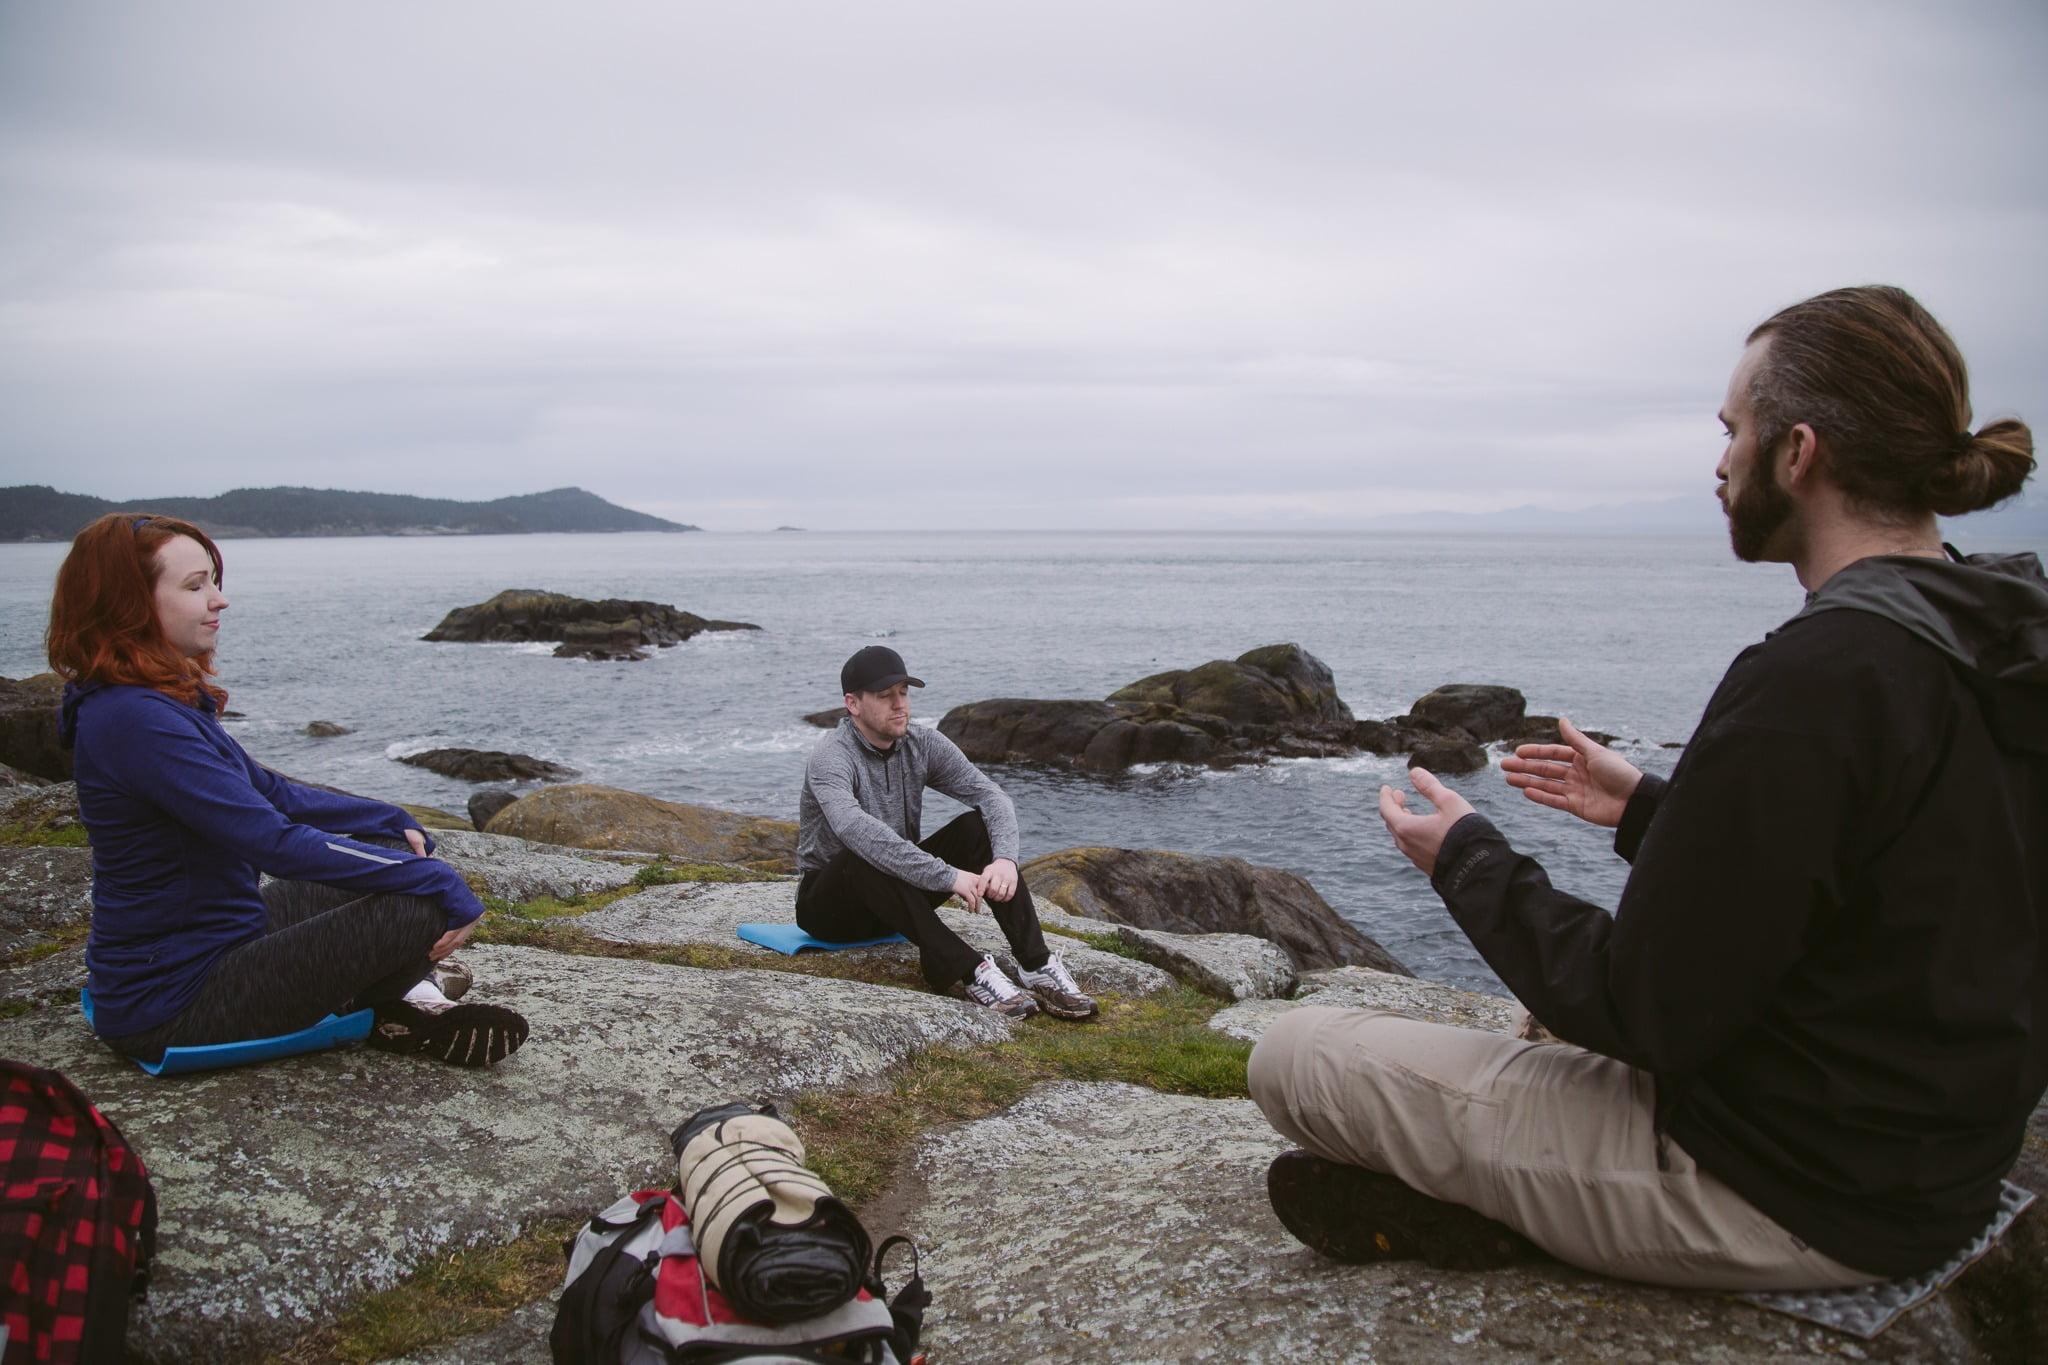 Three People Sat On Rocks Beside The Sea Practicing Wellness And Meditation